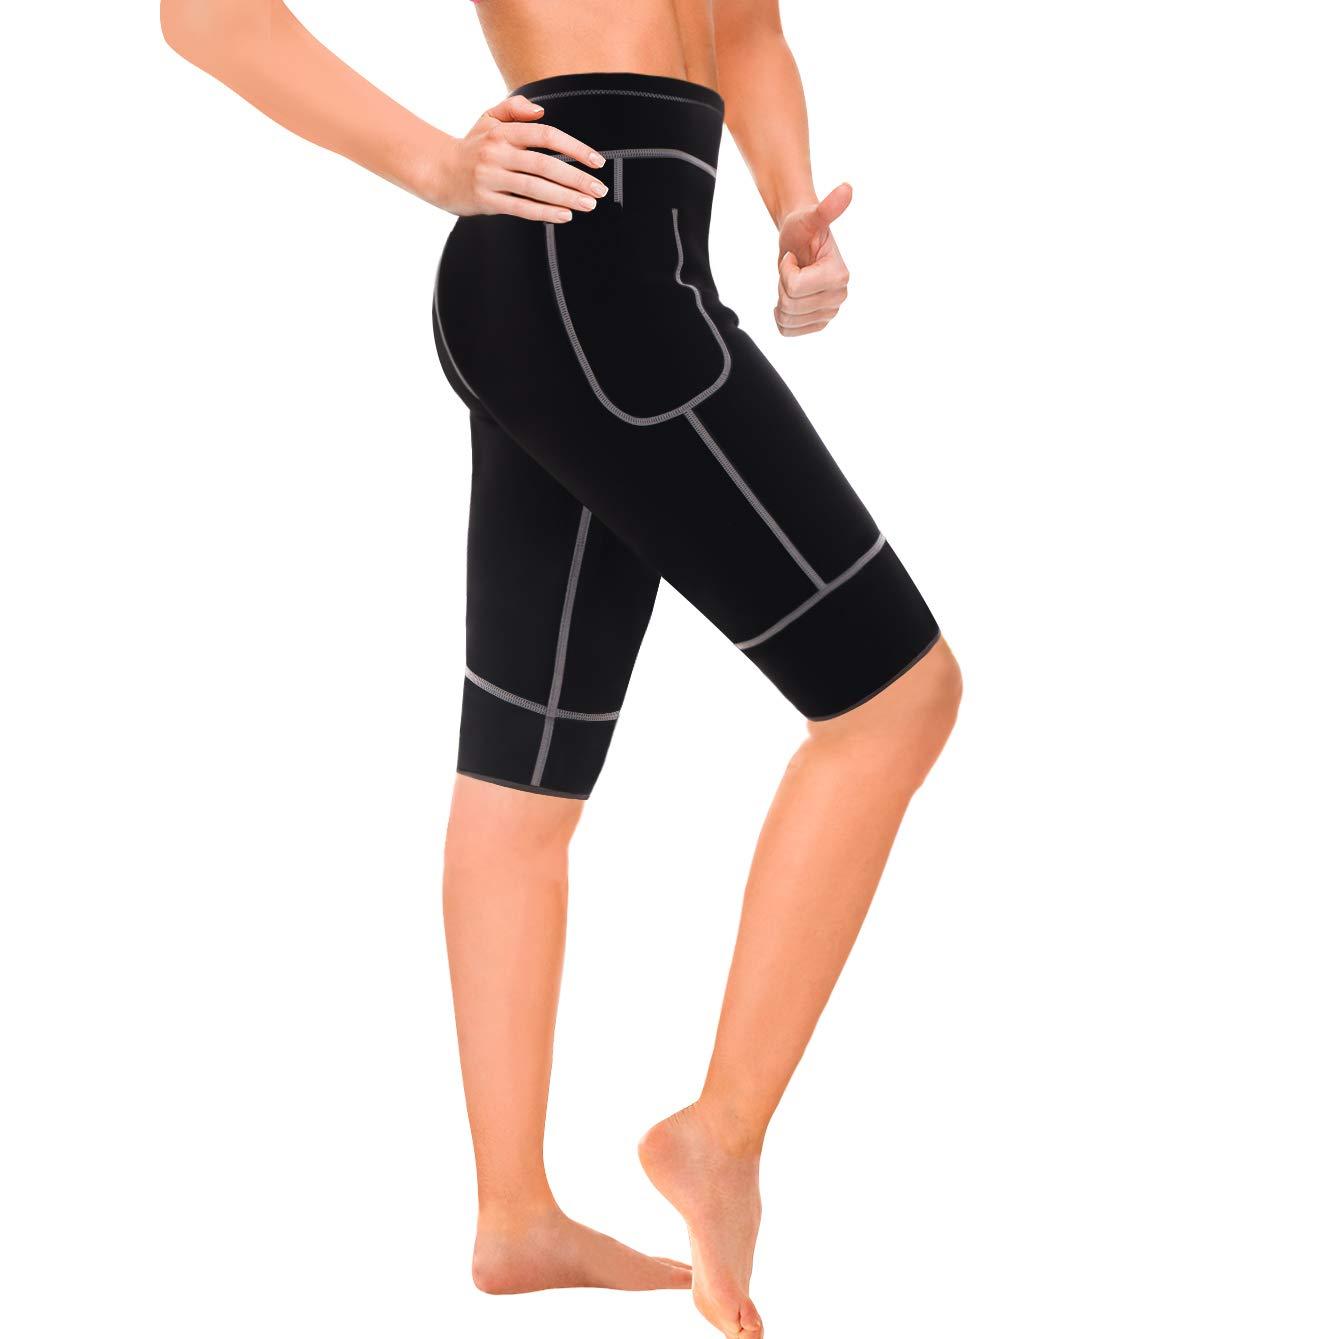 Wonderience Women Sauna Weight Loss Slimming Neoprene Pants with Side Pocket Hot Thermo Fat Burning Sweat Leggings (Black-Gray, S)